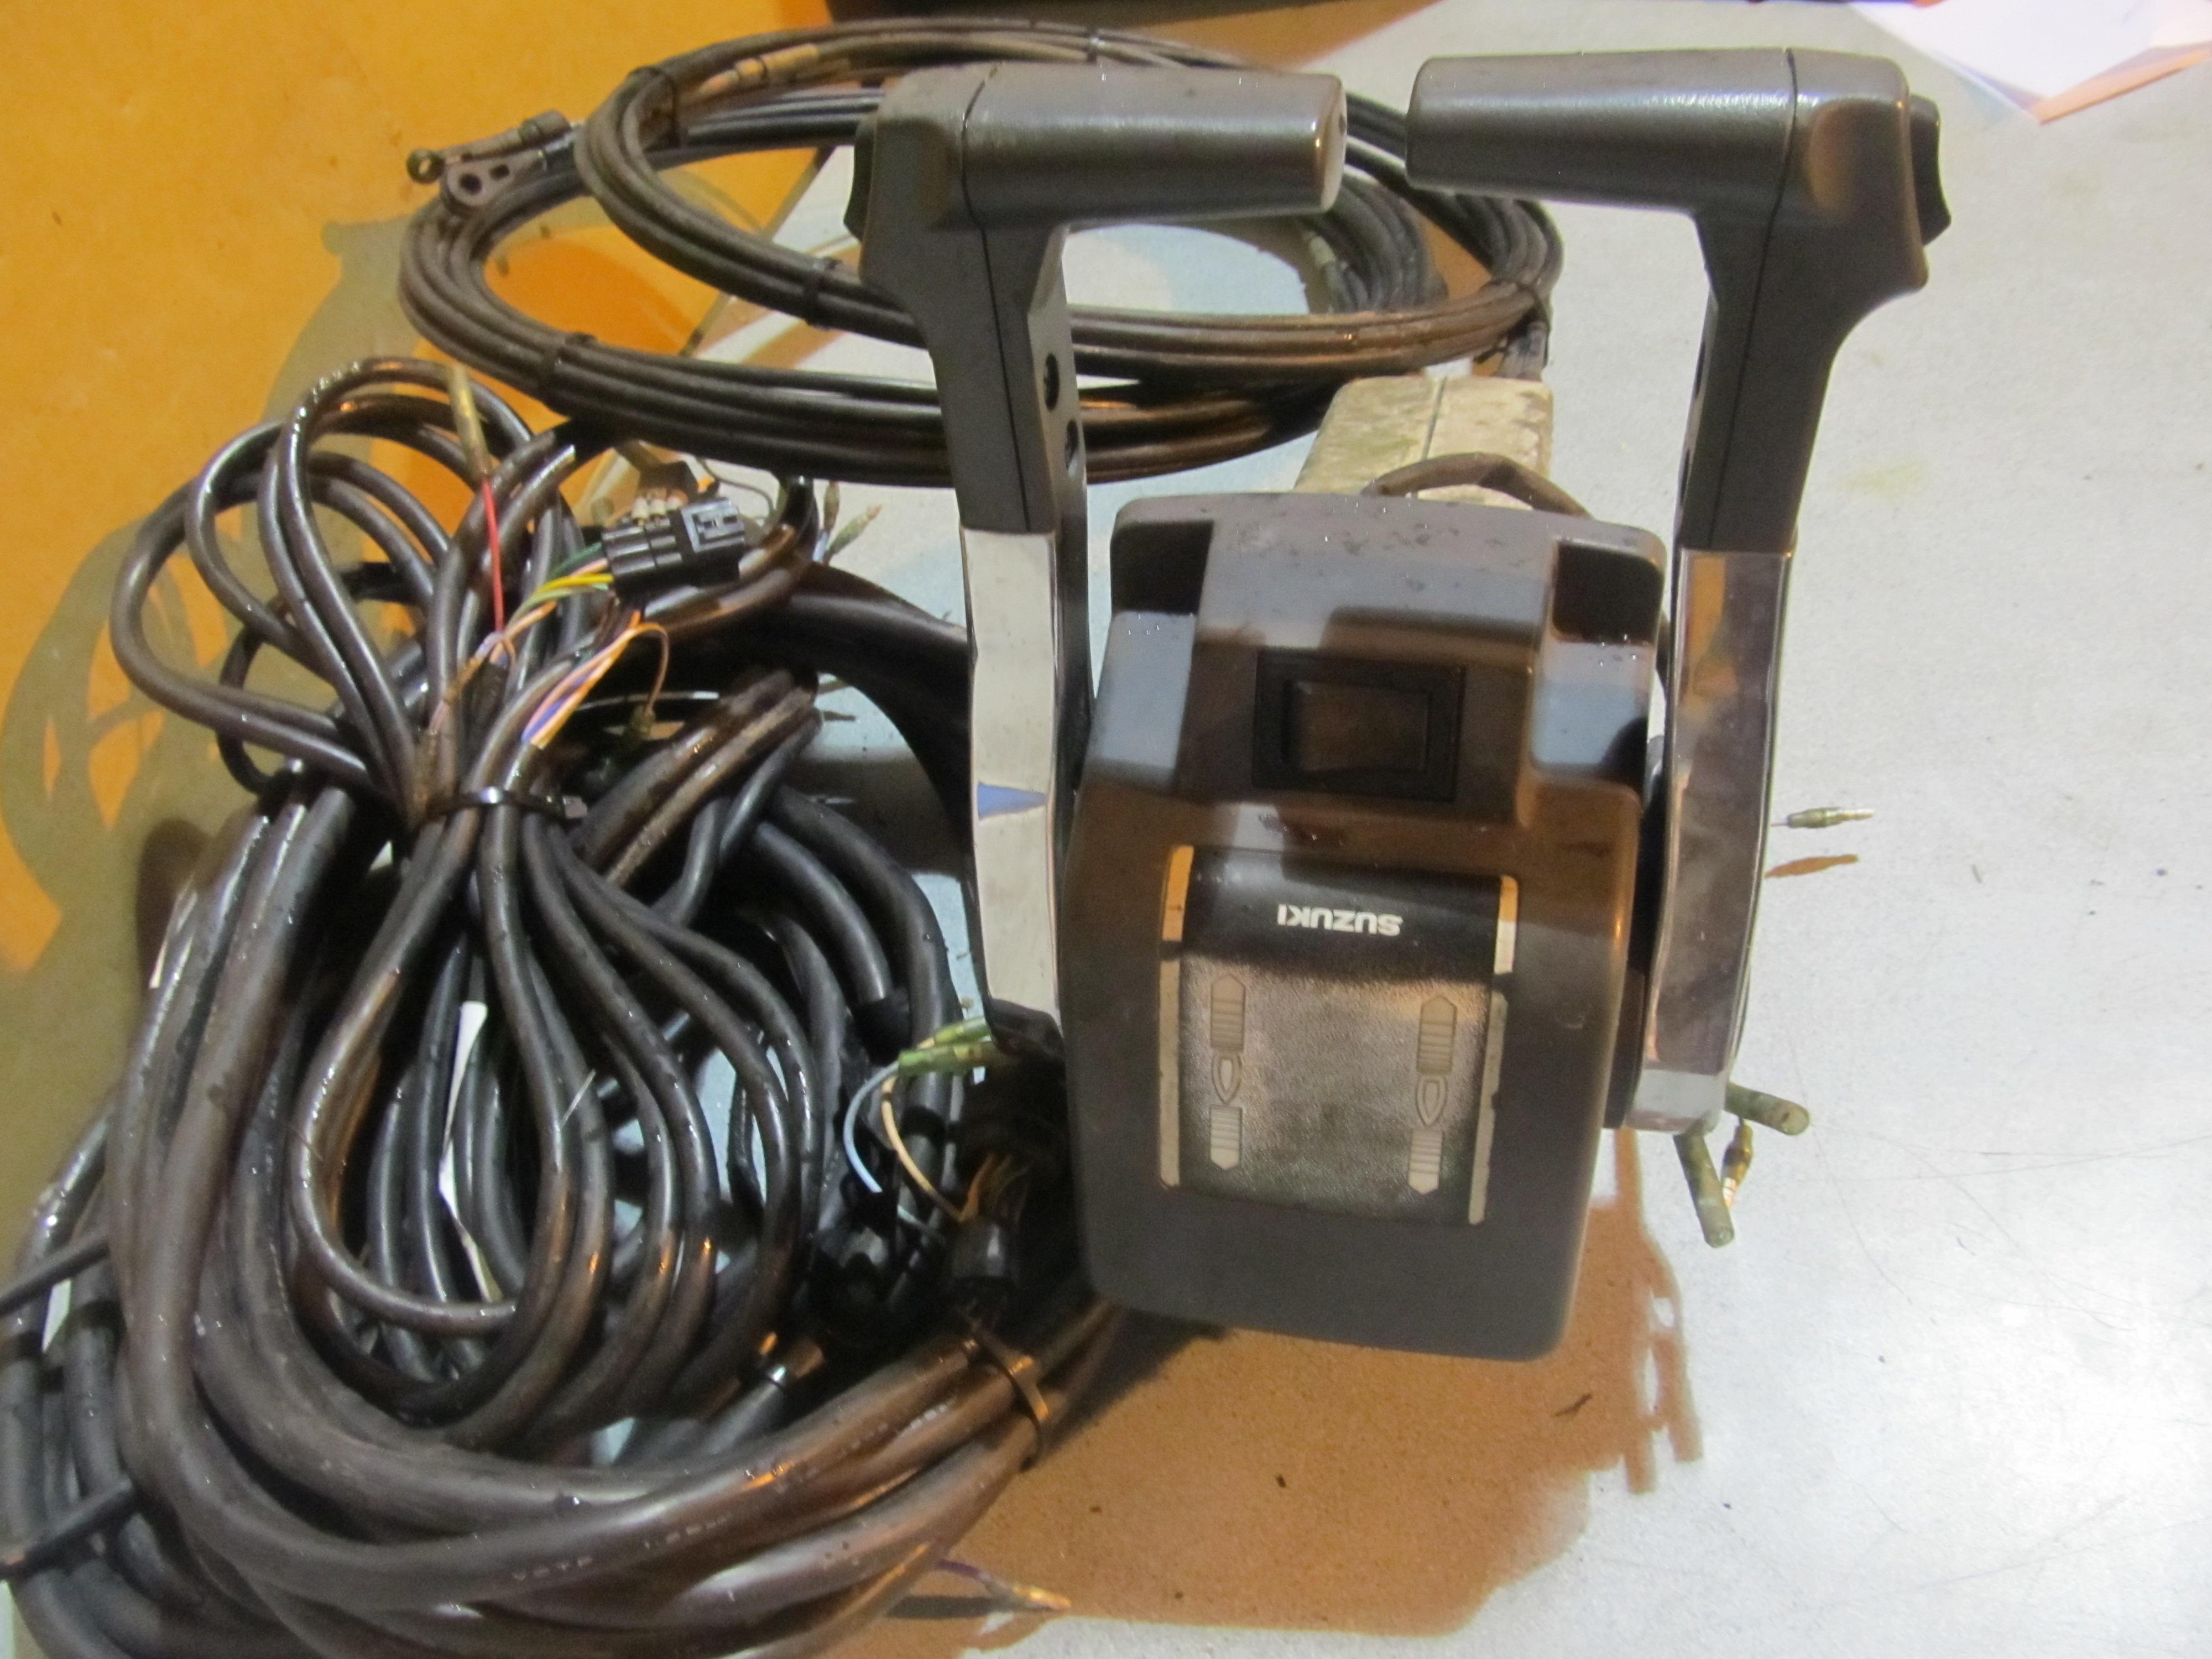 OEM Suzuki Dual Suzuki Deluxe Dual Binnacle Control Box w/ Wiring Harness